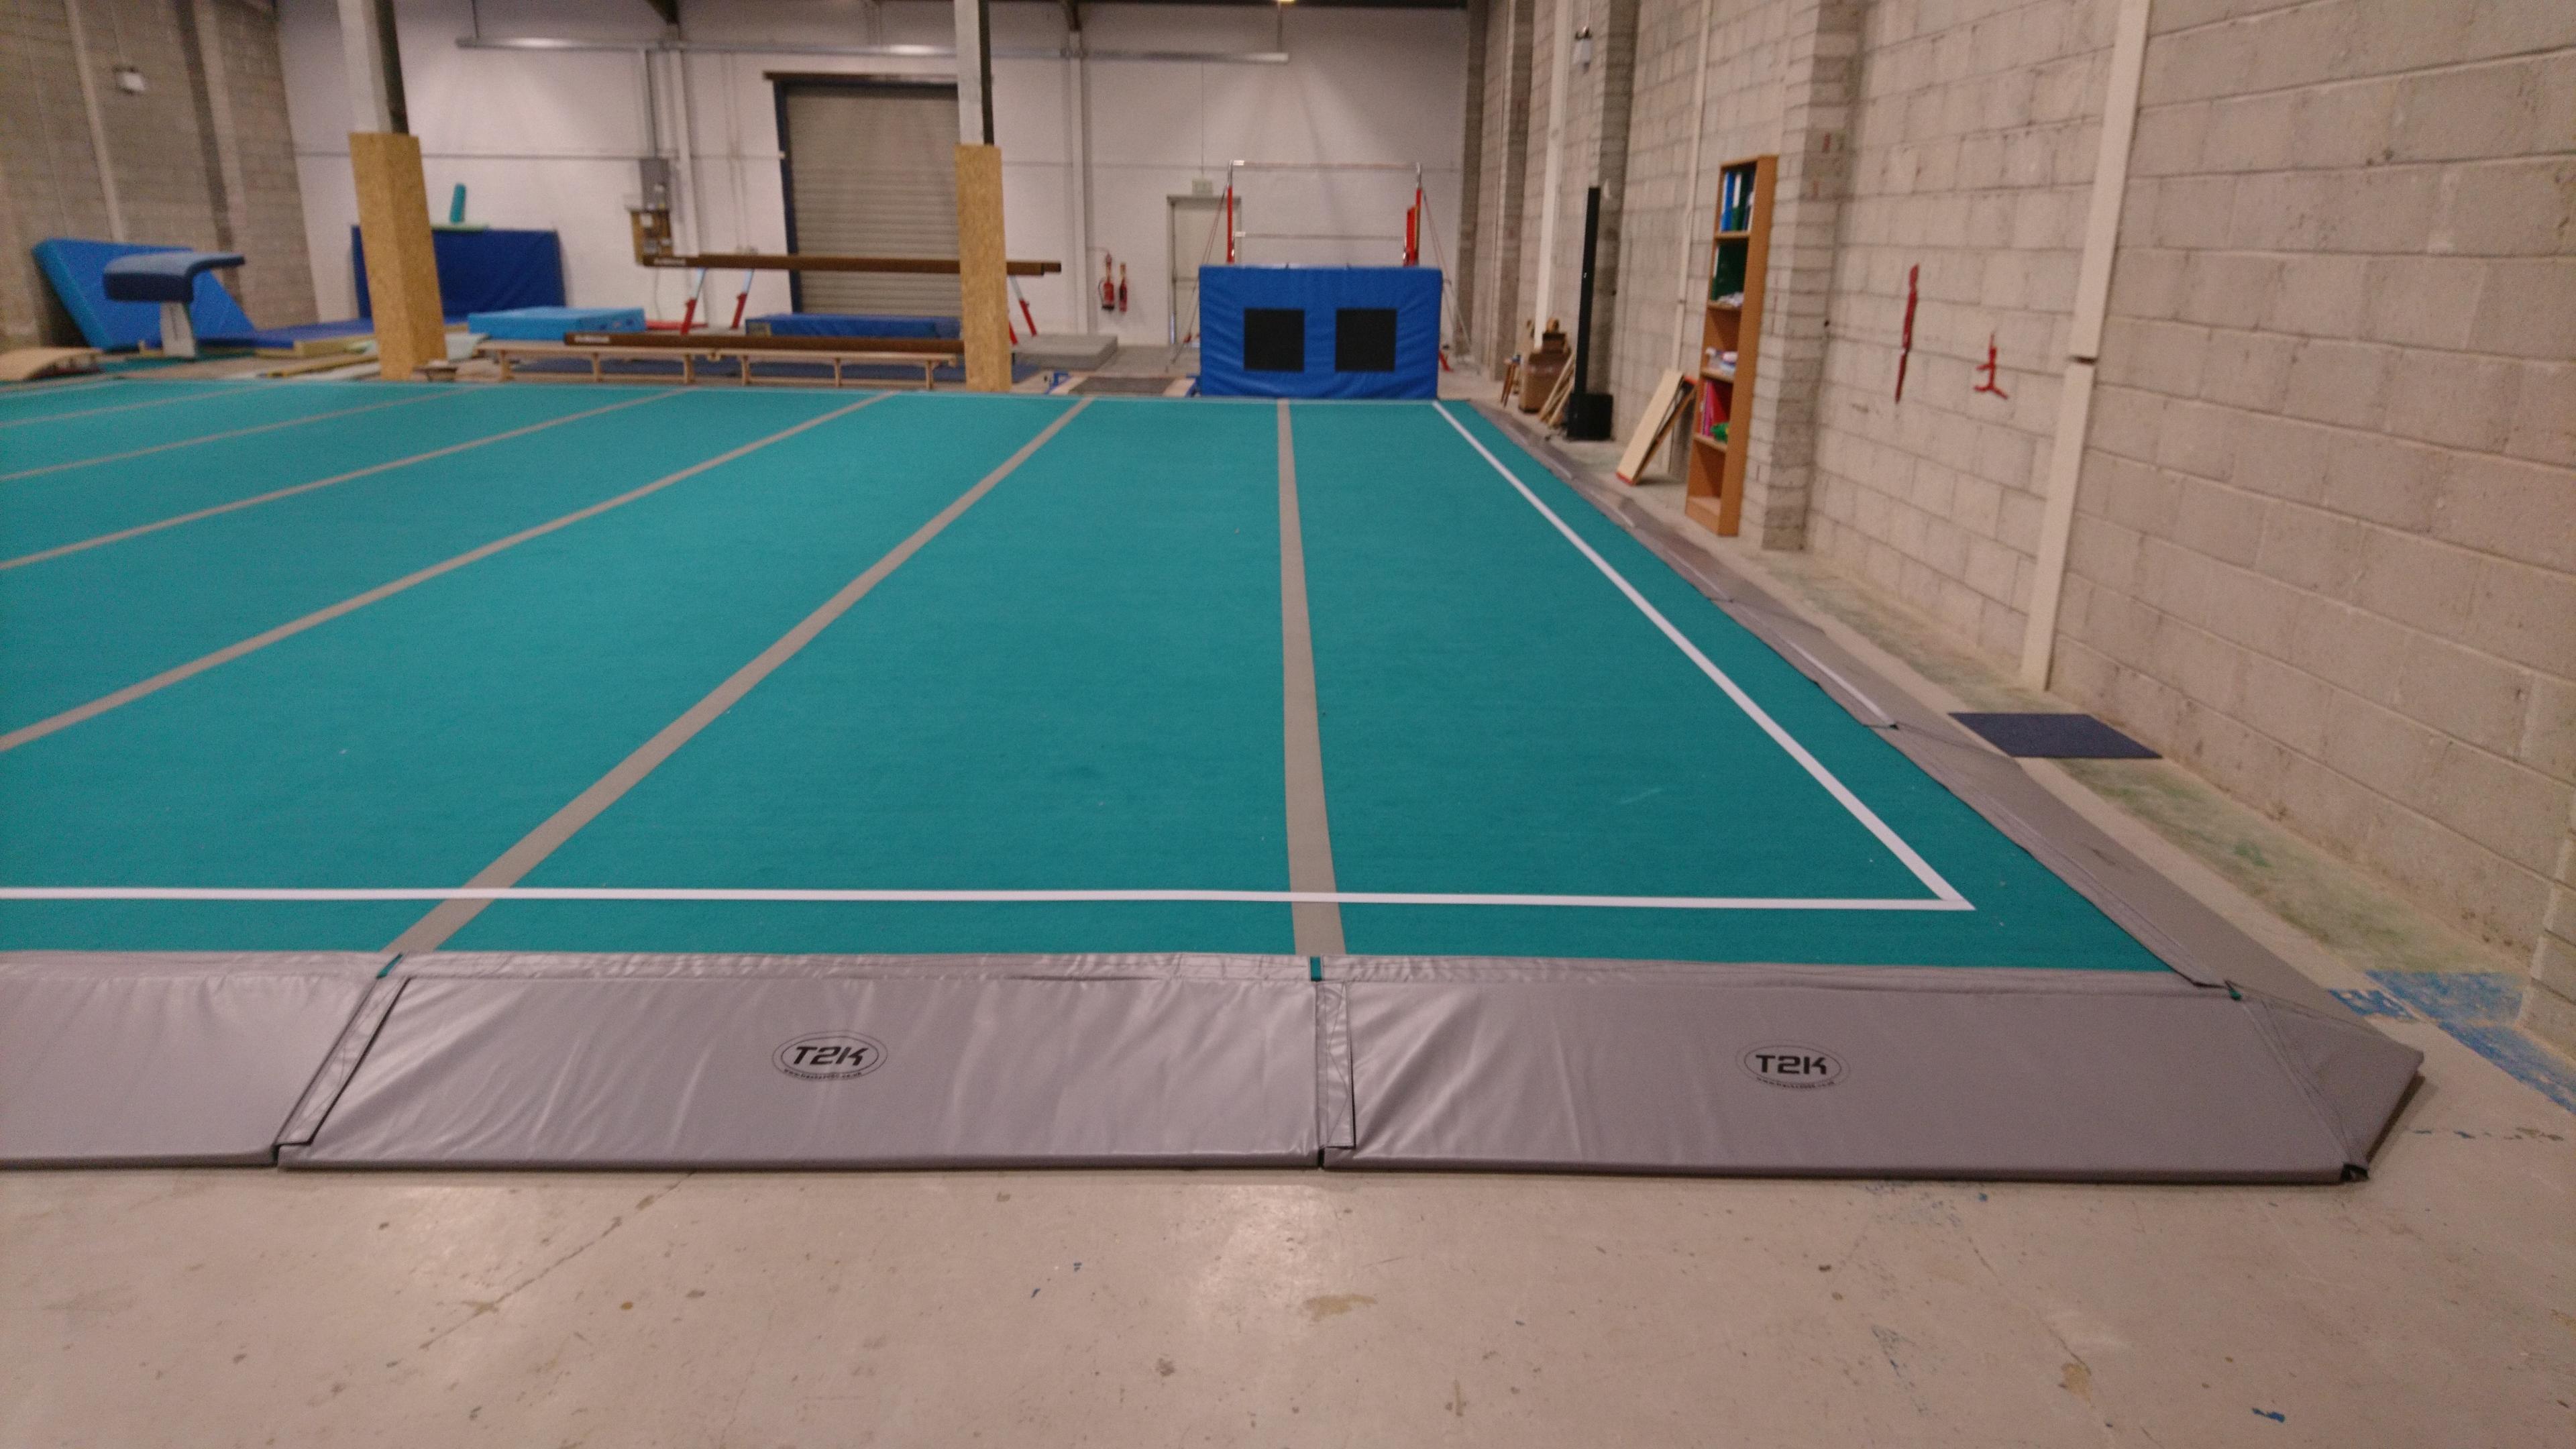 Gymnastics Spring Floor